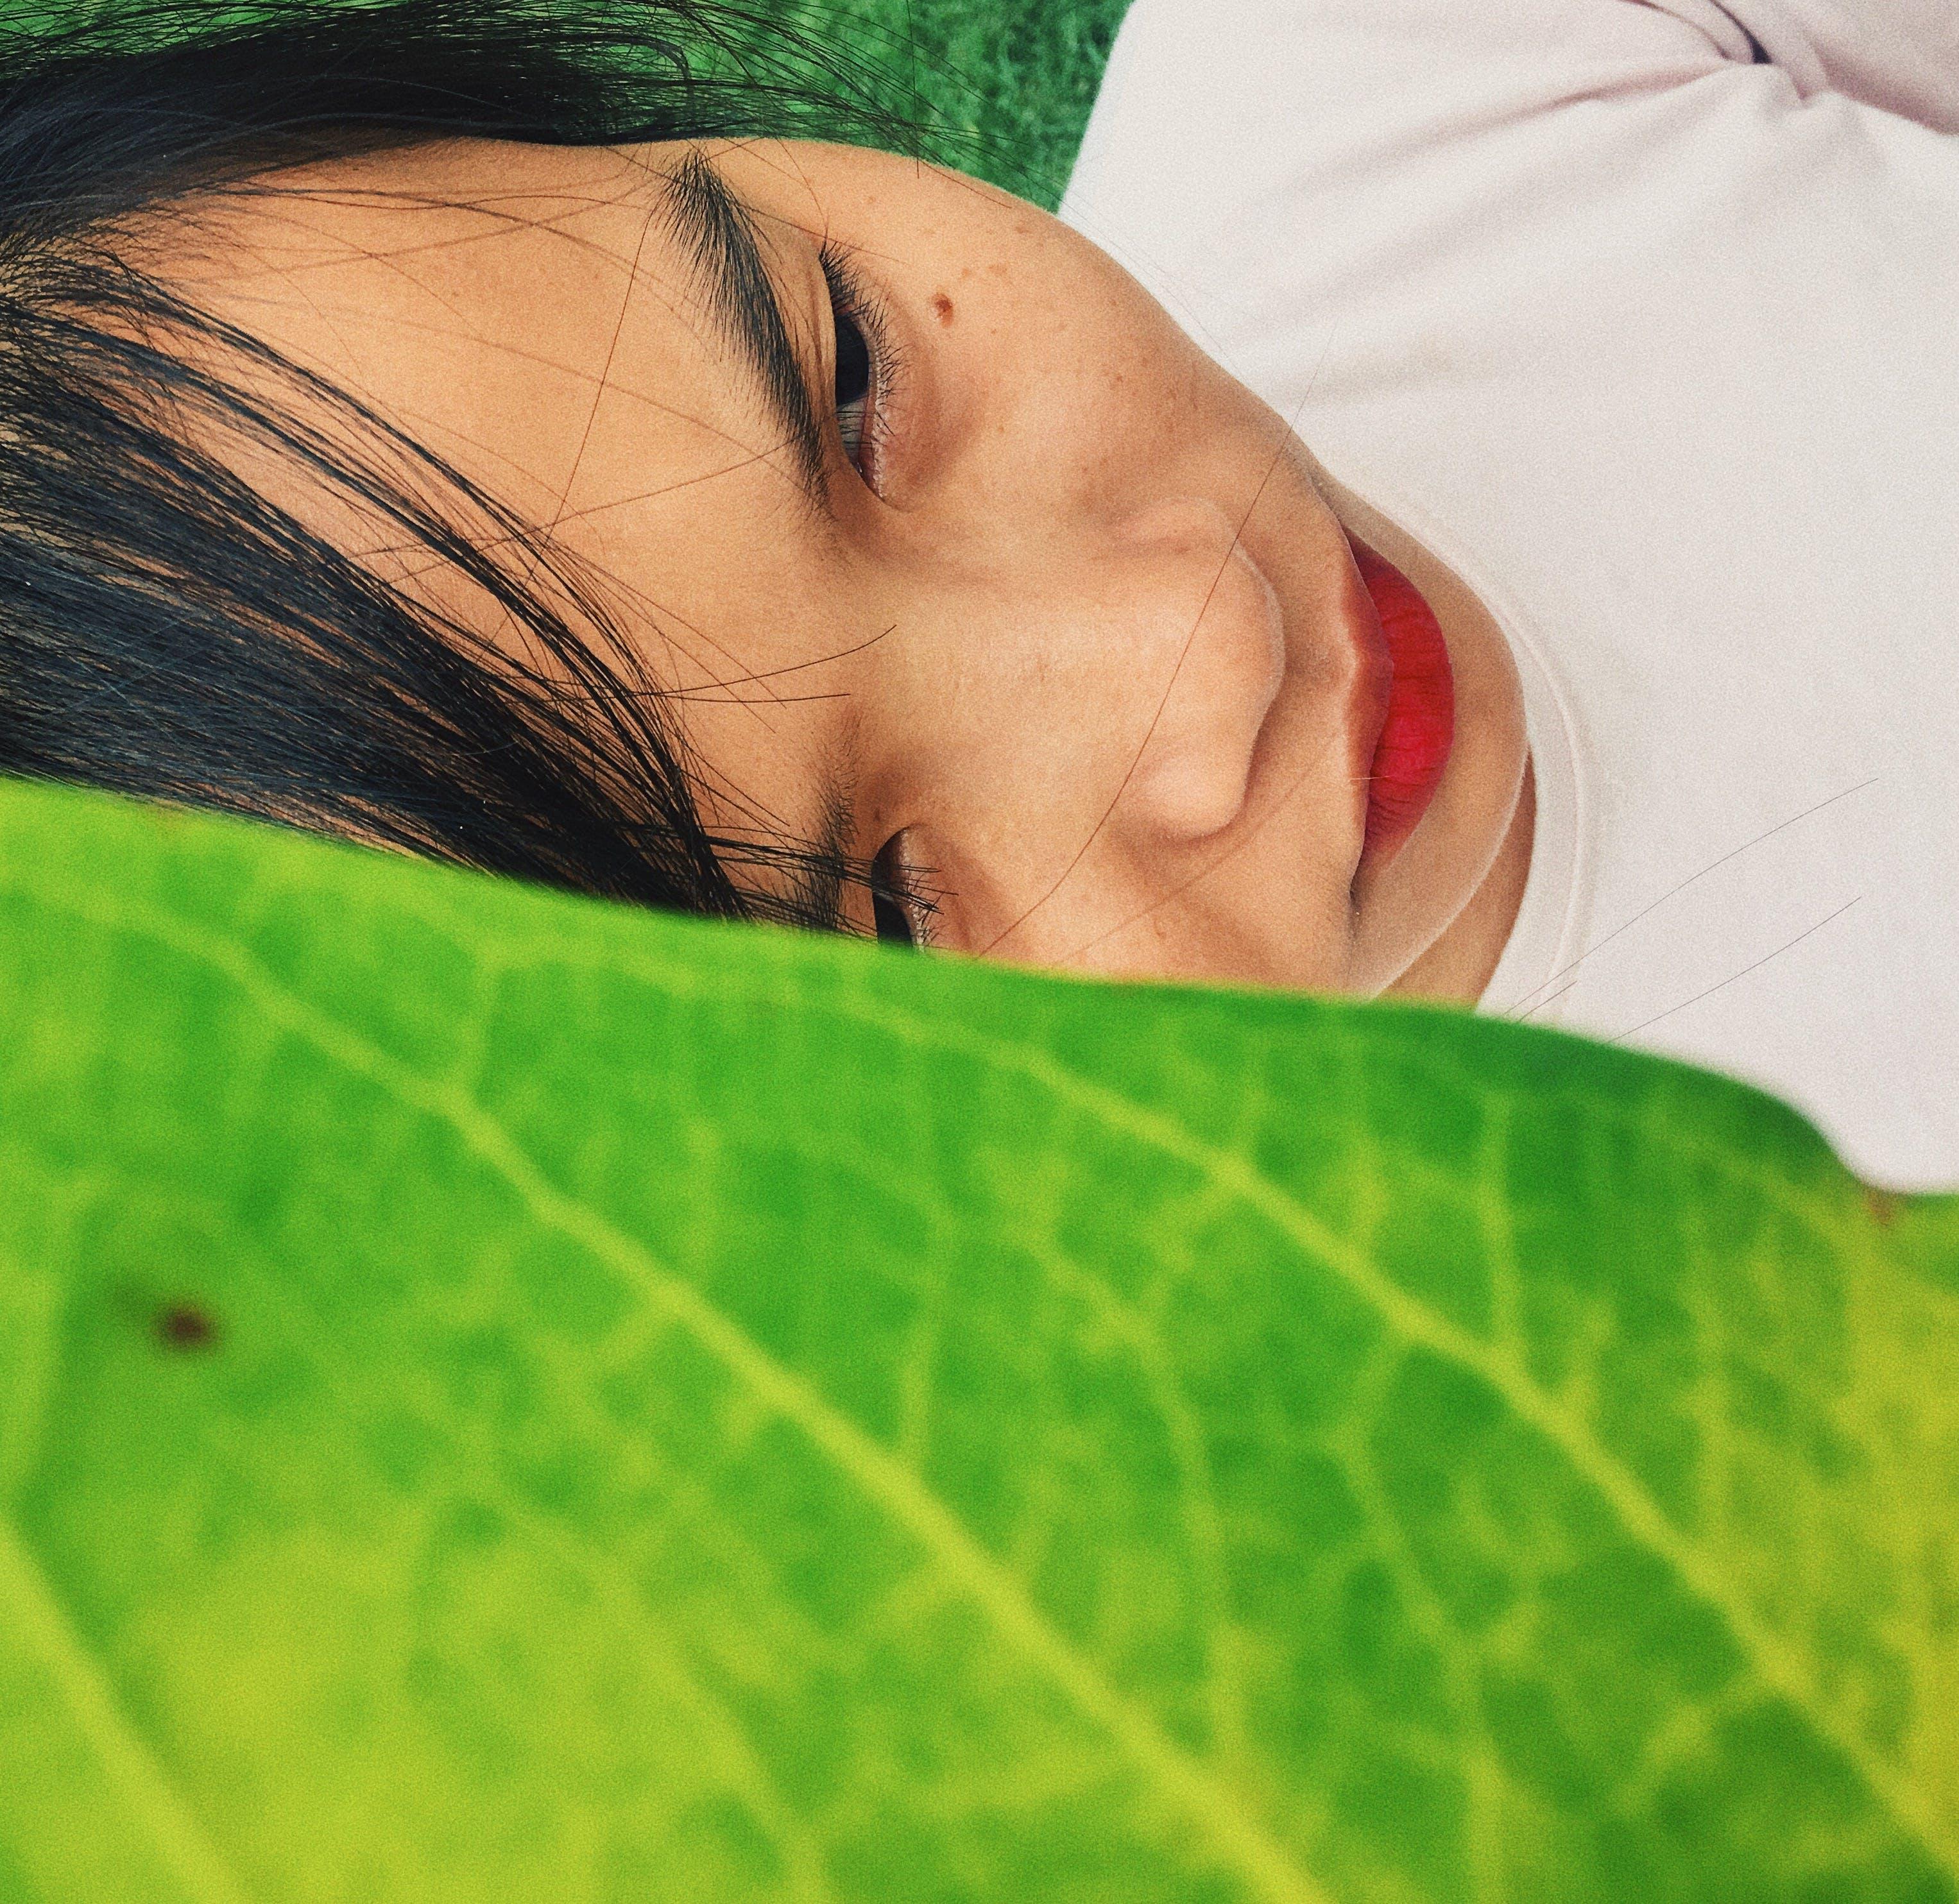 Person Behind Green Leaf